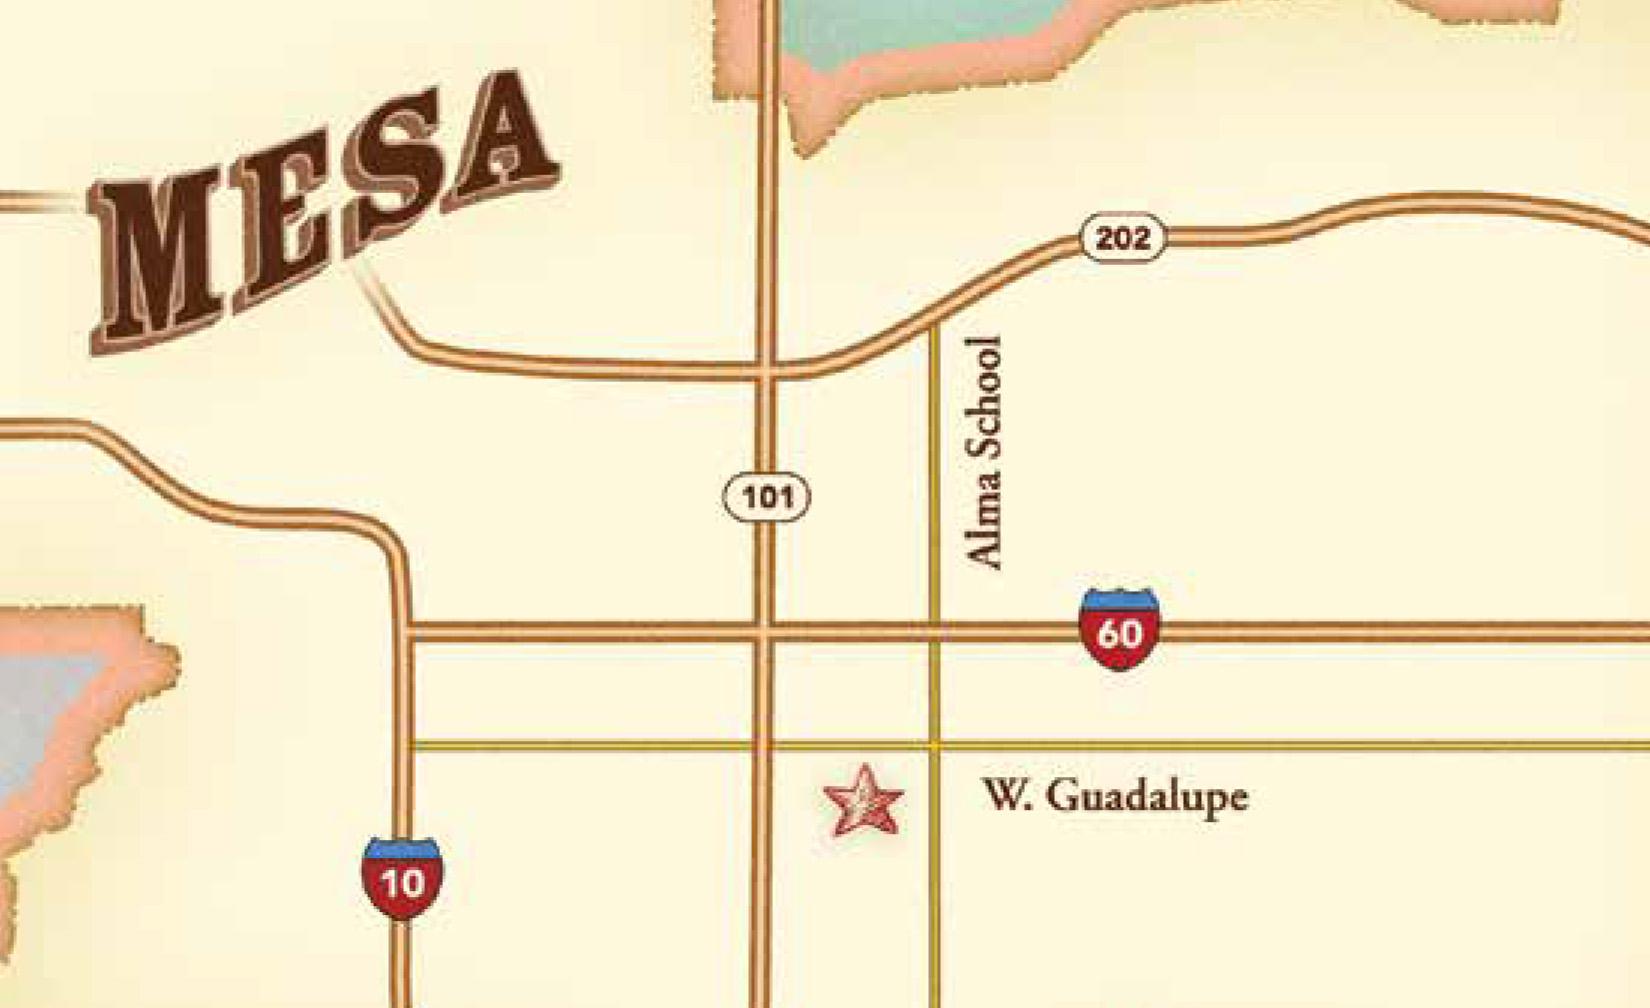 Phoenix AZ area business White Dove Thrift Shoppes